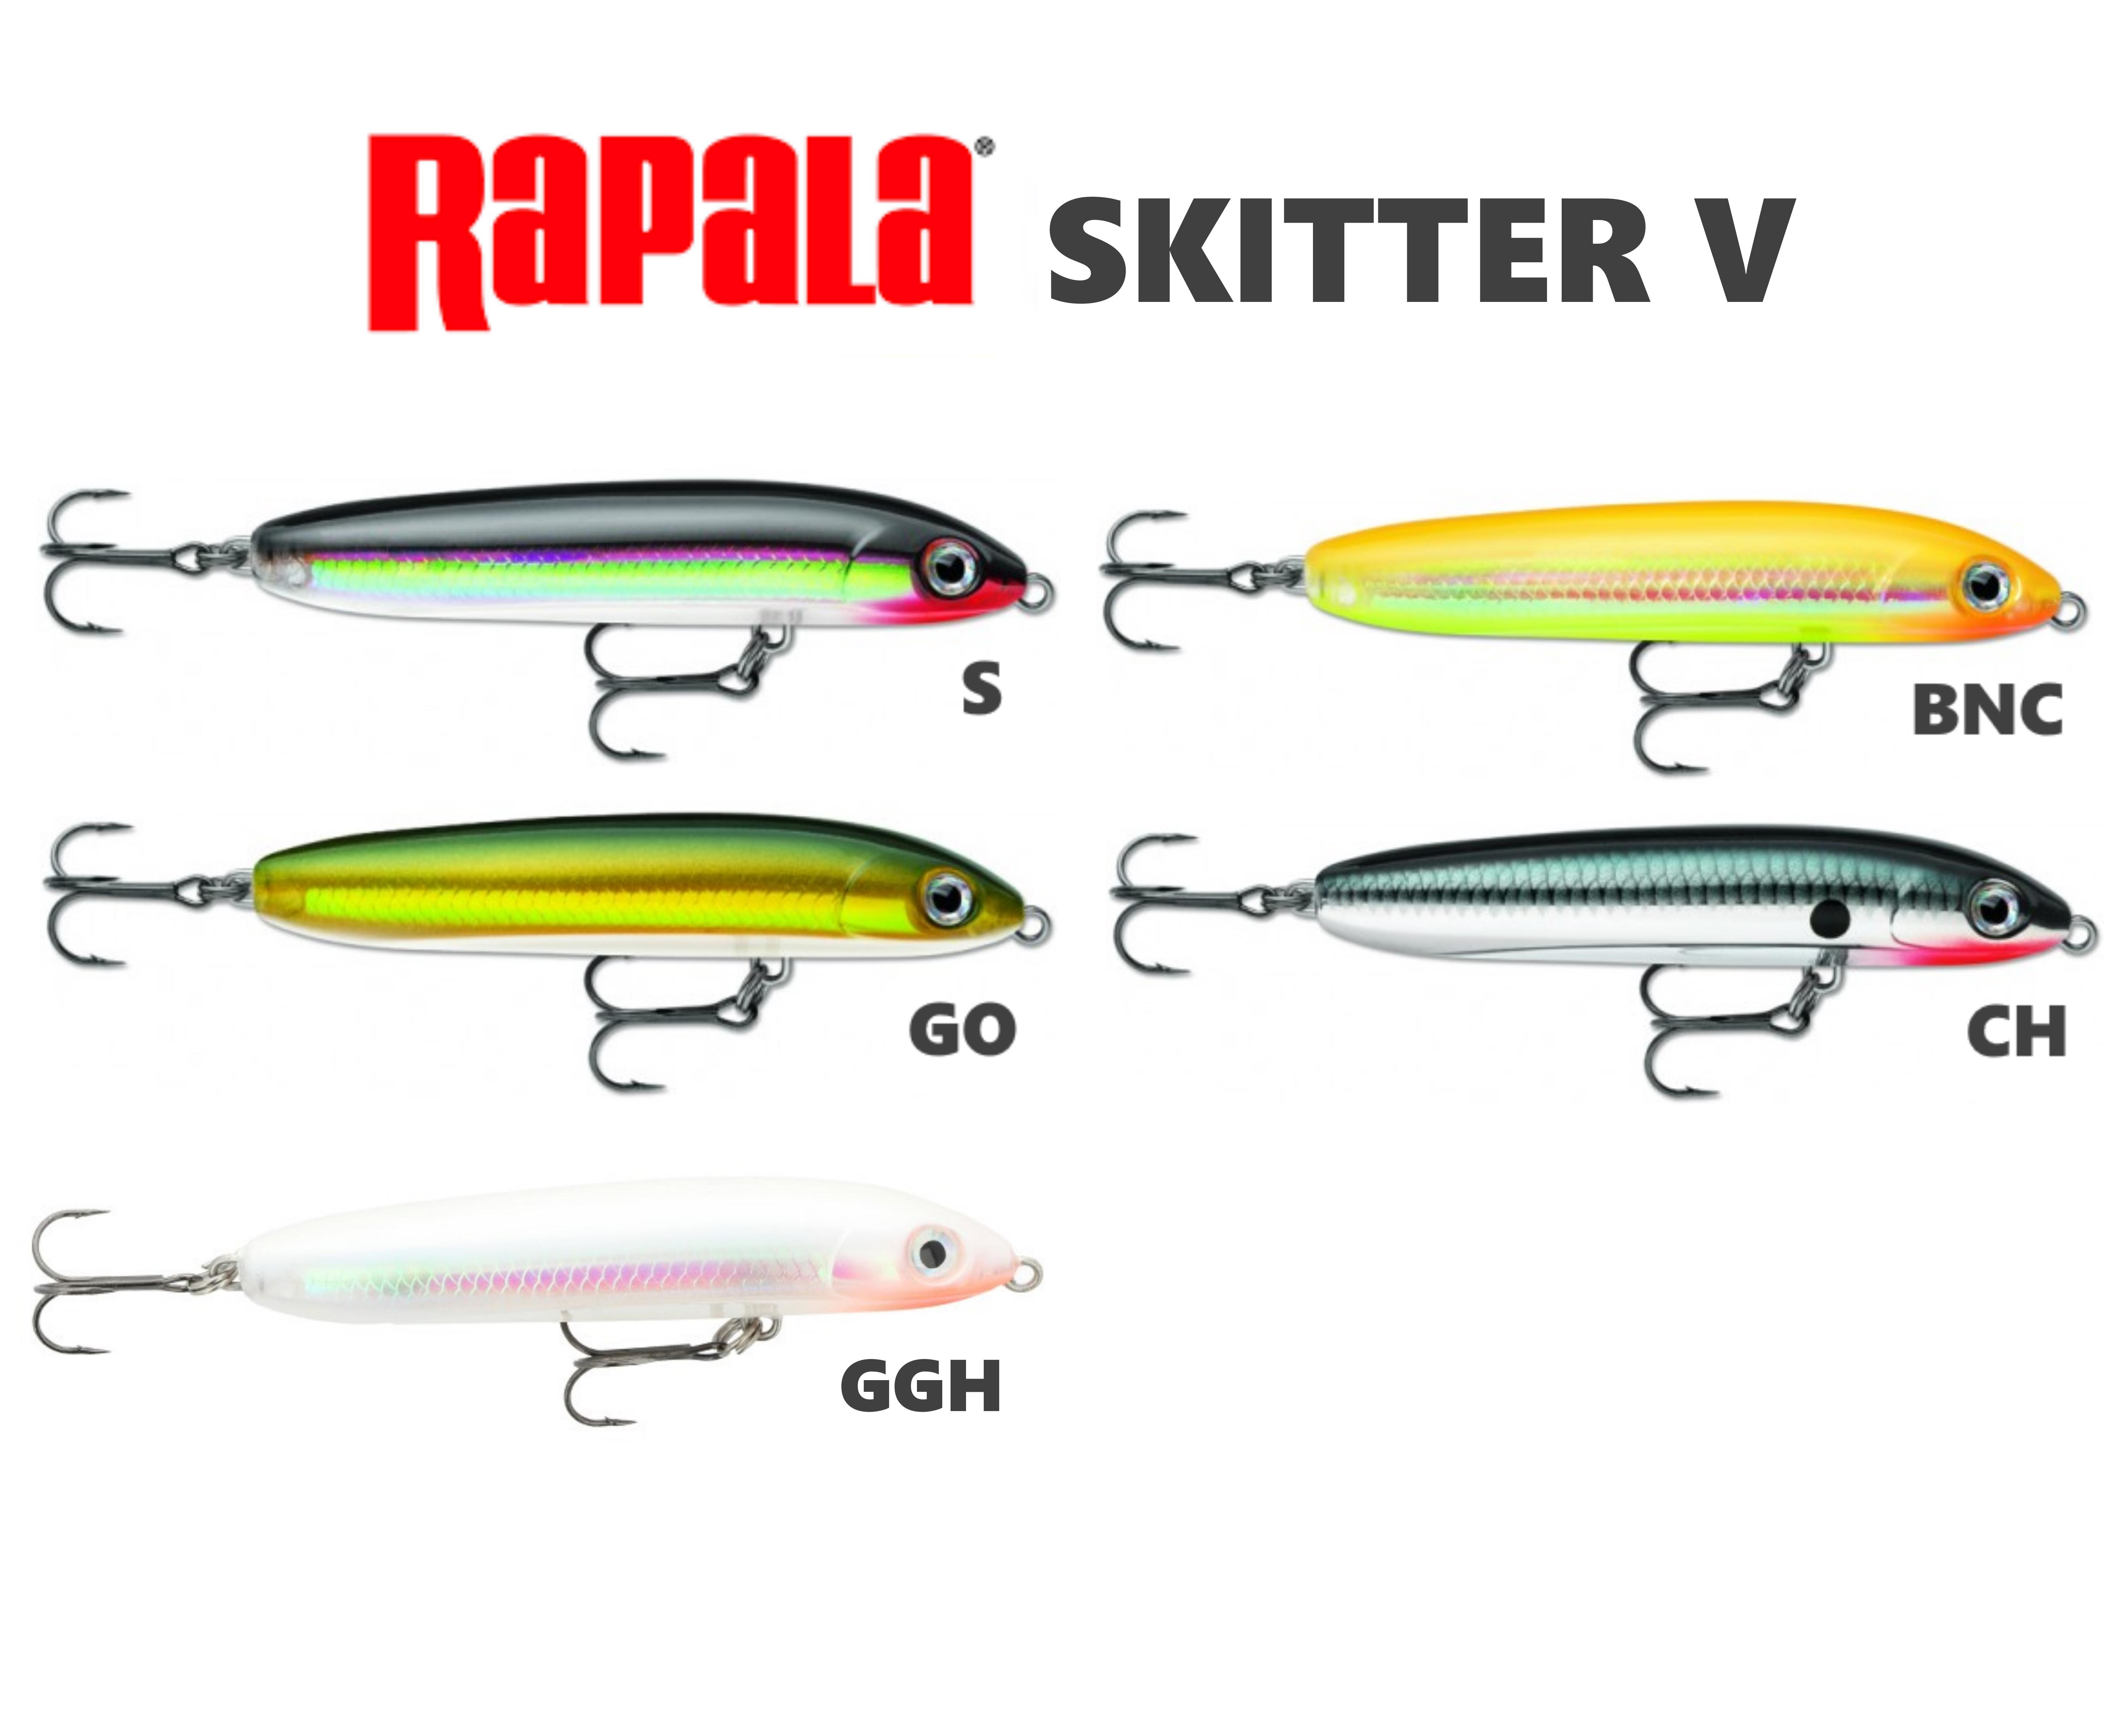 Rapala Skitter V Pesca Barrento